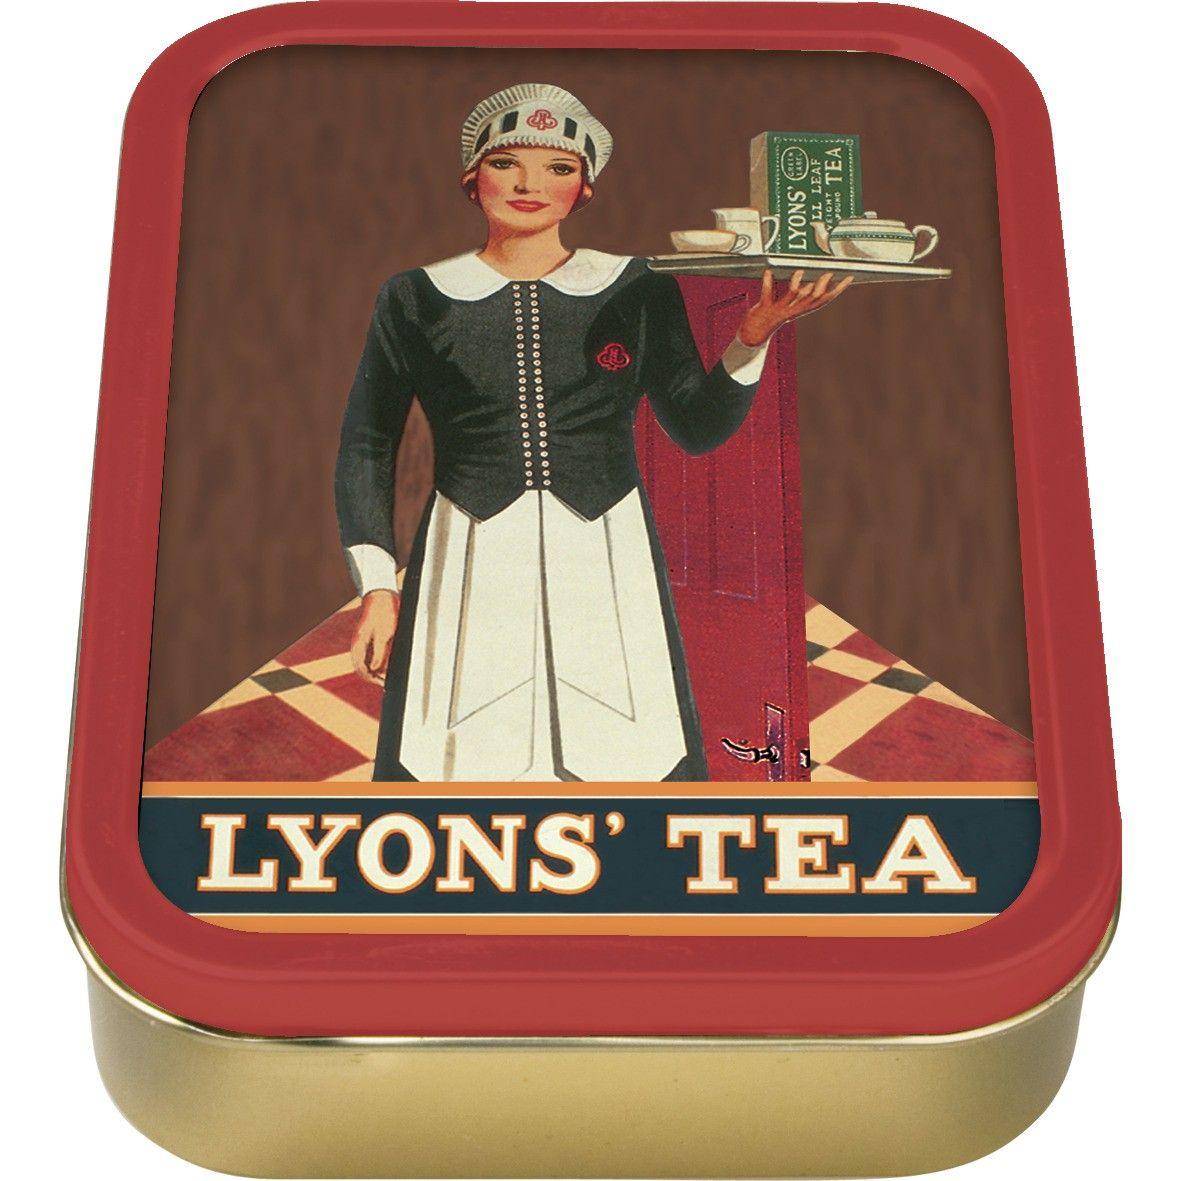 http://images.esellerpro.com/2486/I/397/0/lrgscaleCollector-Tin-Lyons-Tea.jpg